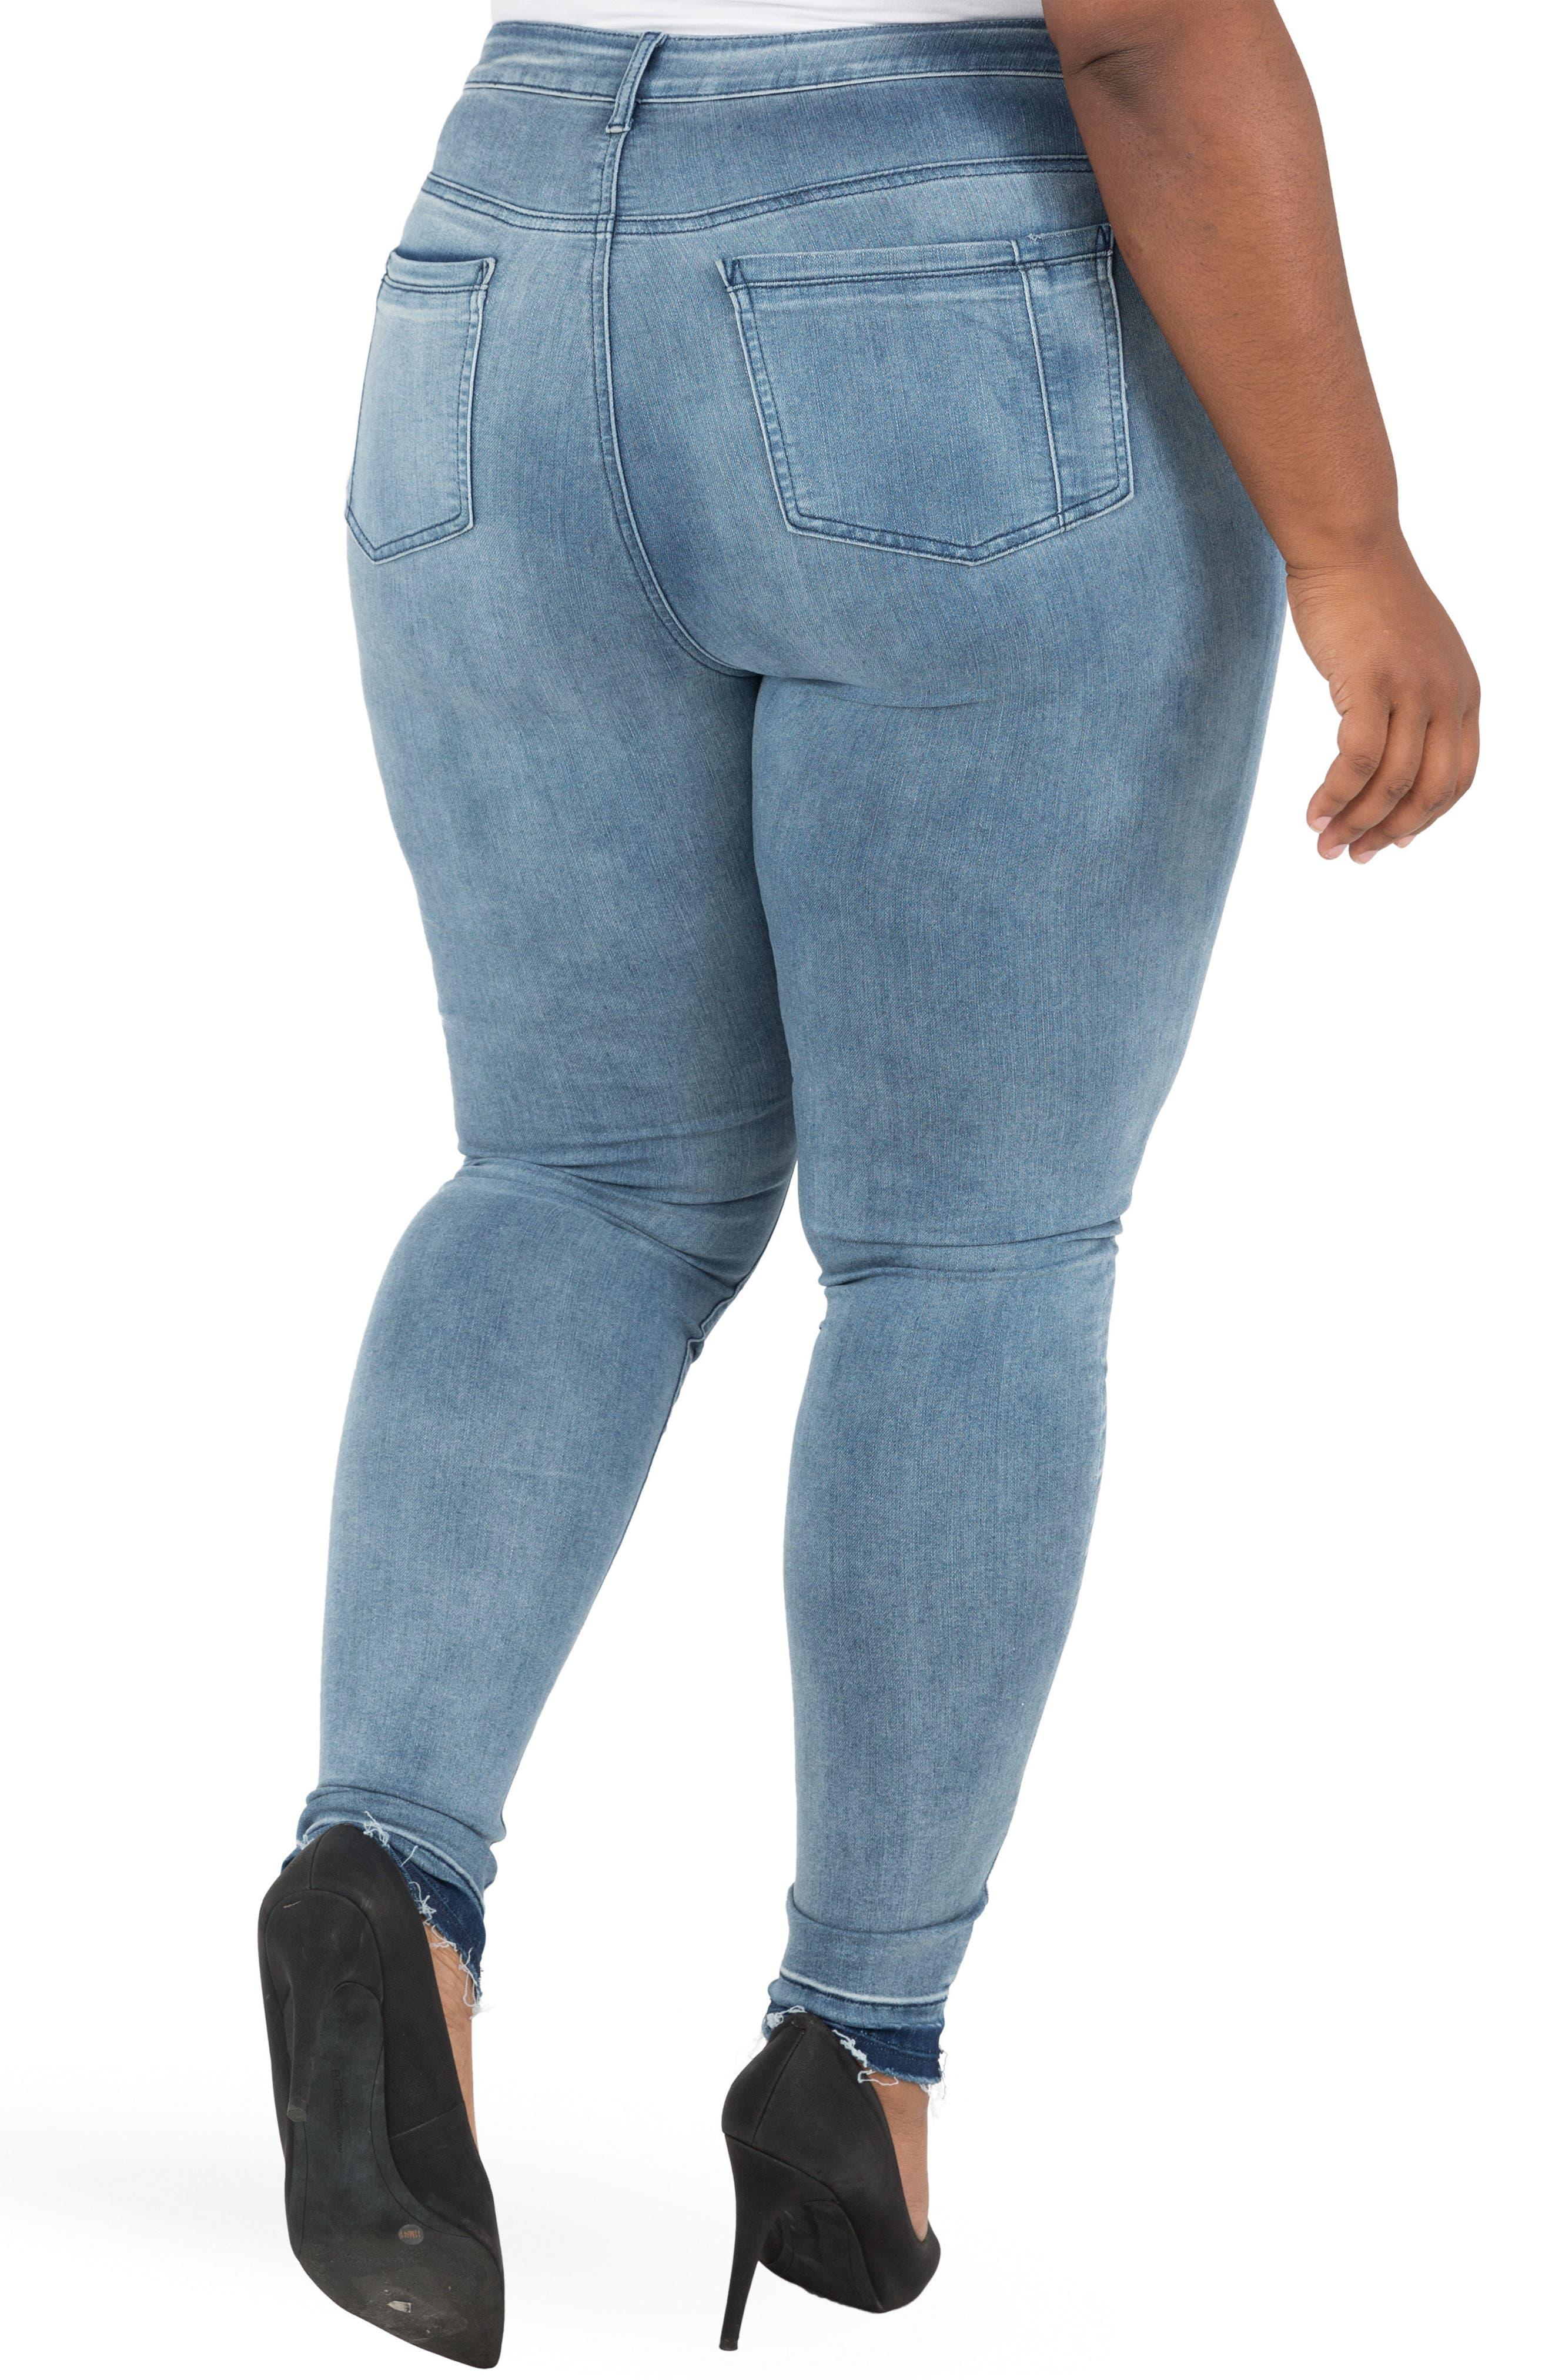 Corrine Release Hem Skinny Crop Jeans,                             Alternate thumbnail 2, color,                             LIGHT BLUE